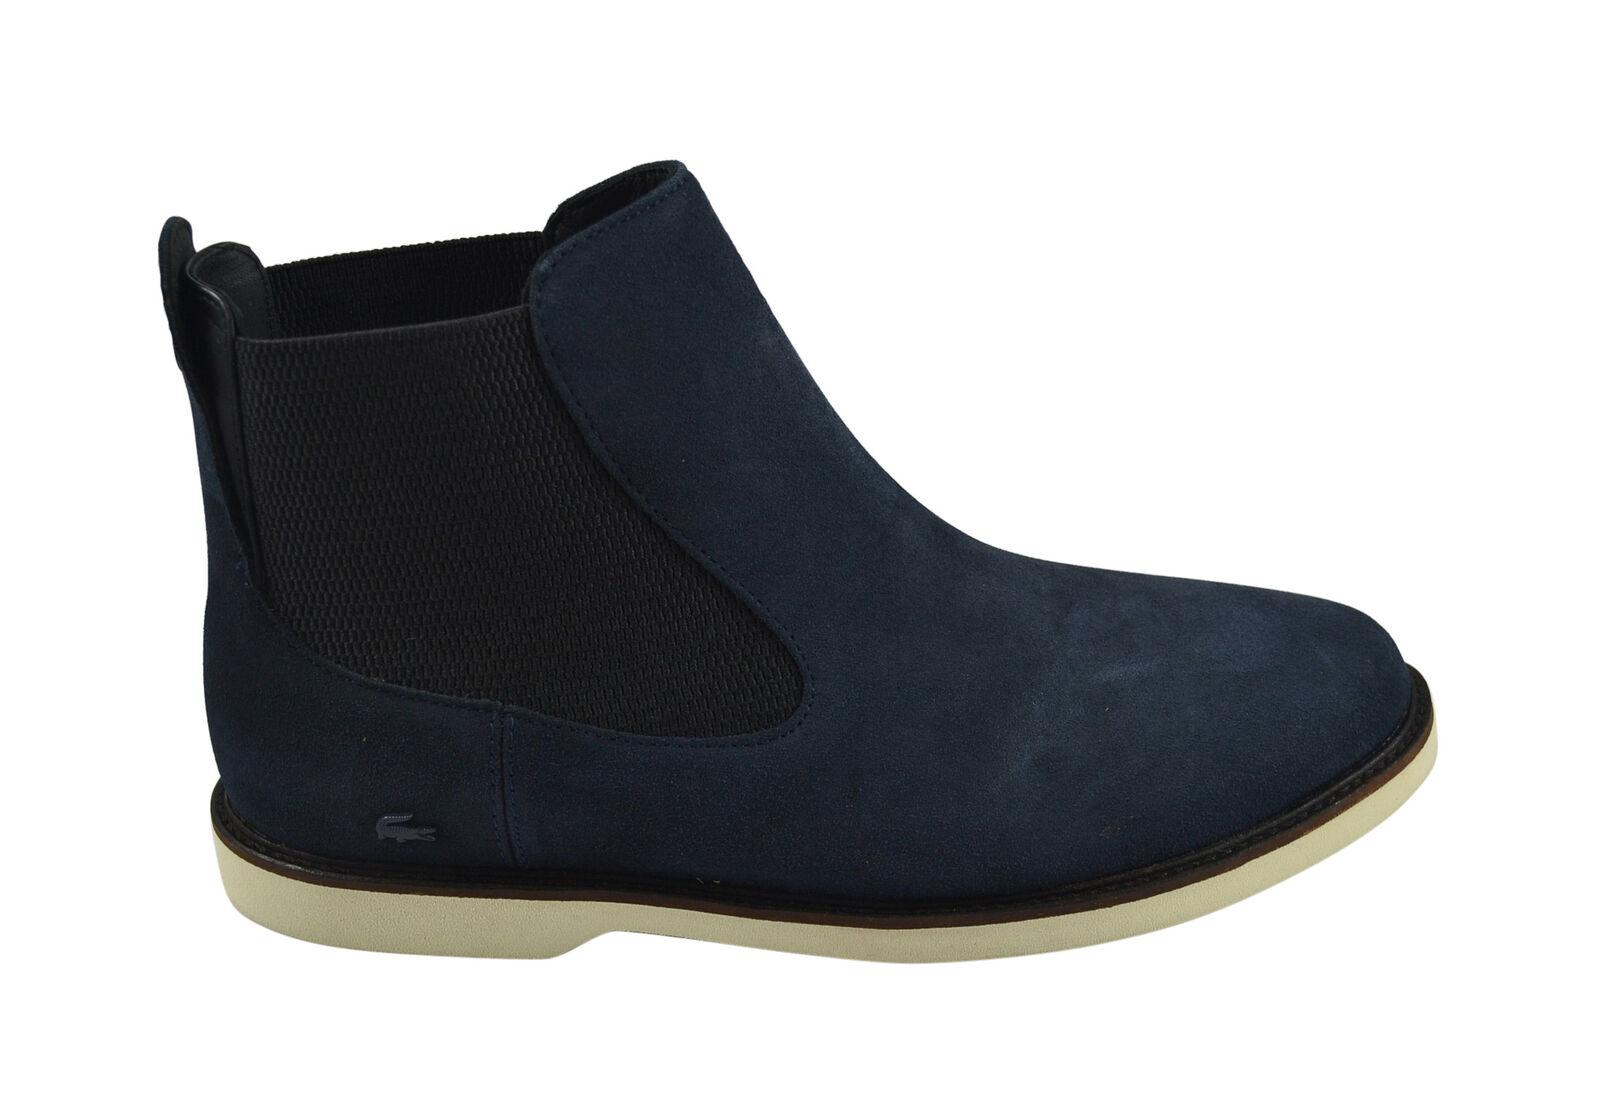 Lacoste thionna SRW dark blue botas zapatos/